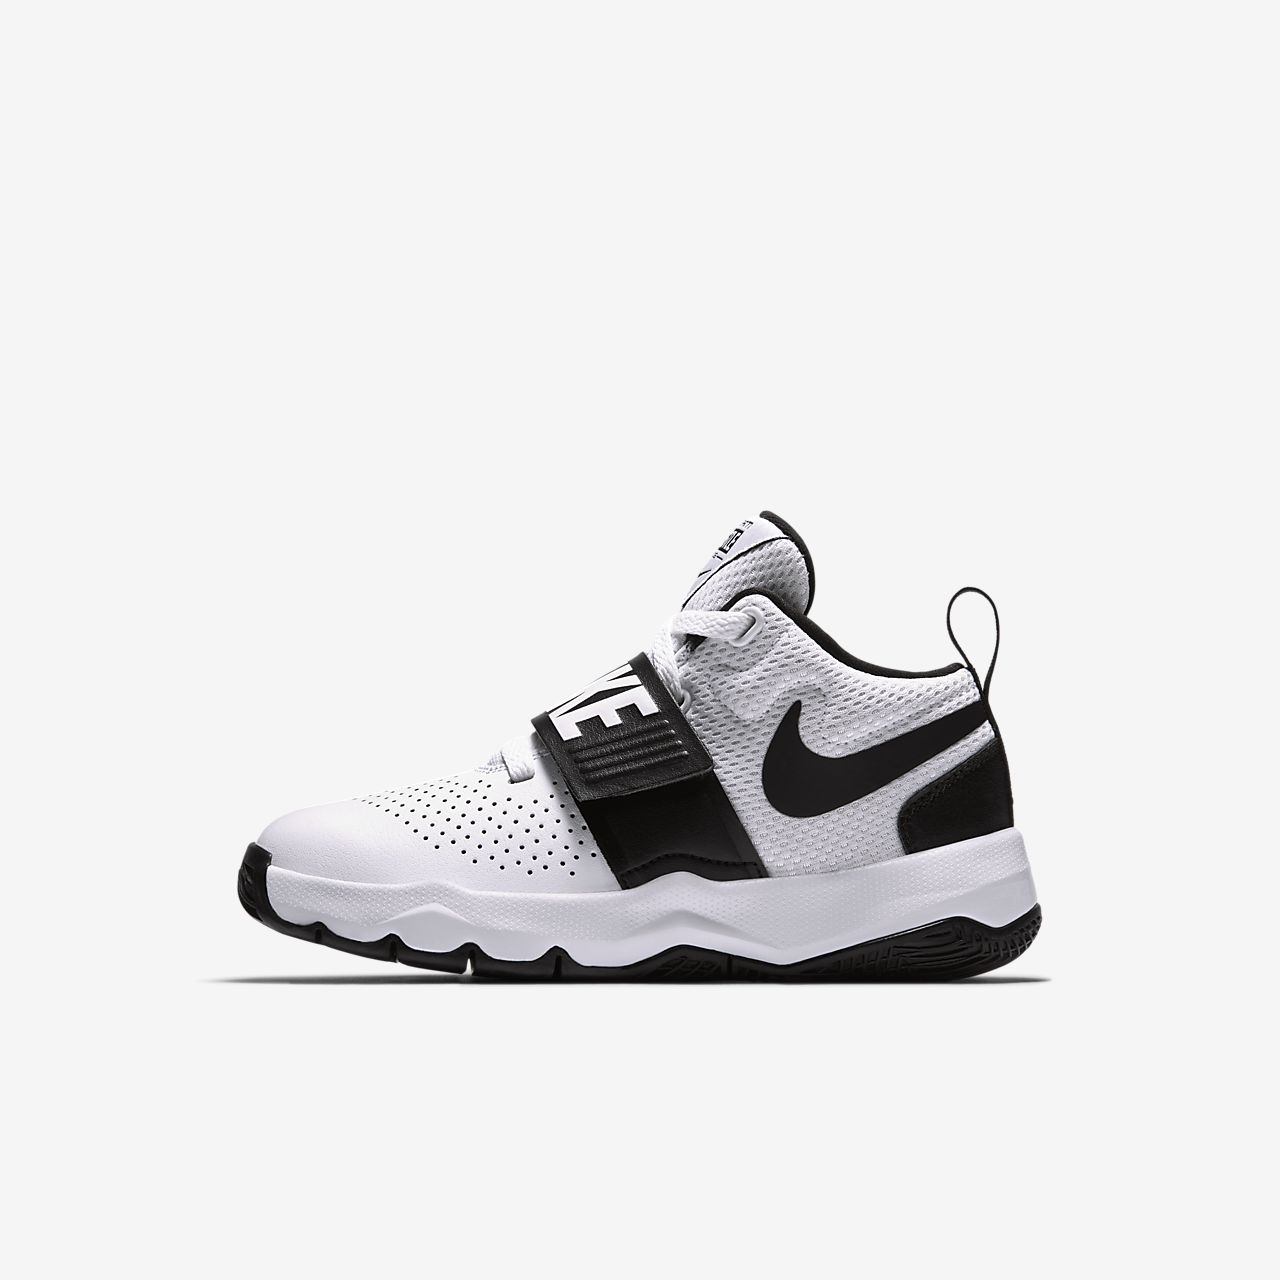 e478c2279d03a4 Nike Team Hustle D 8 Little Kids  Basketball Shoe. Nike.com